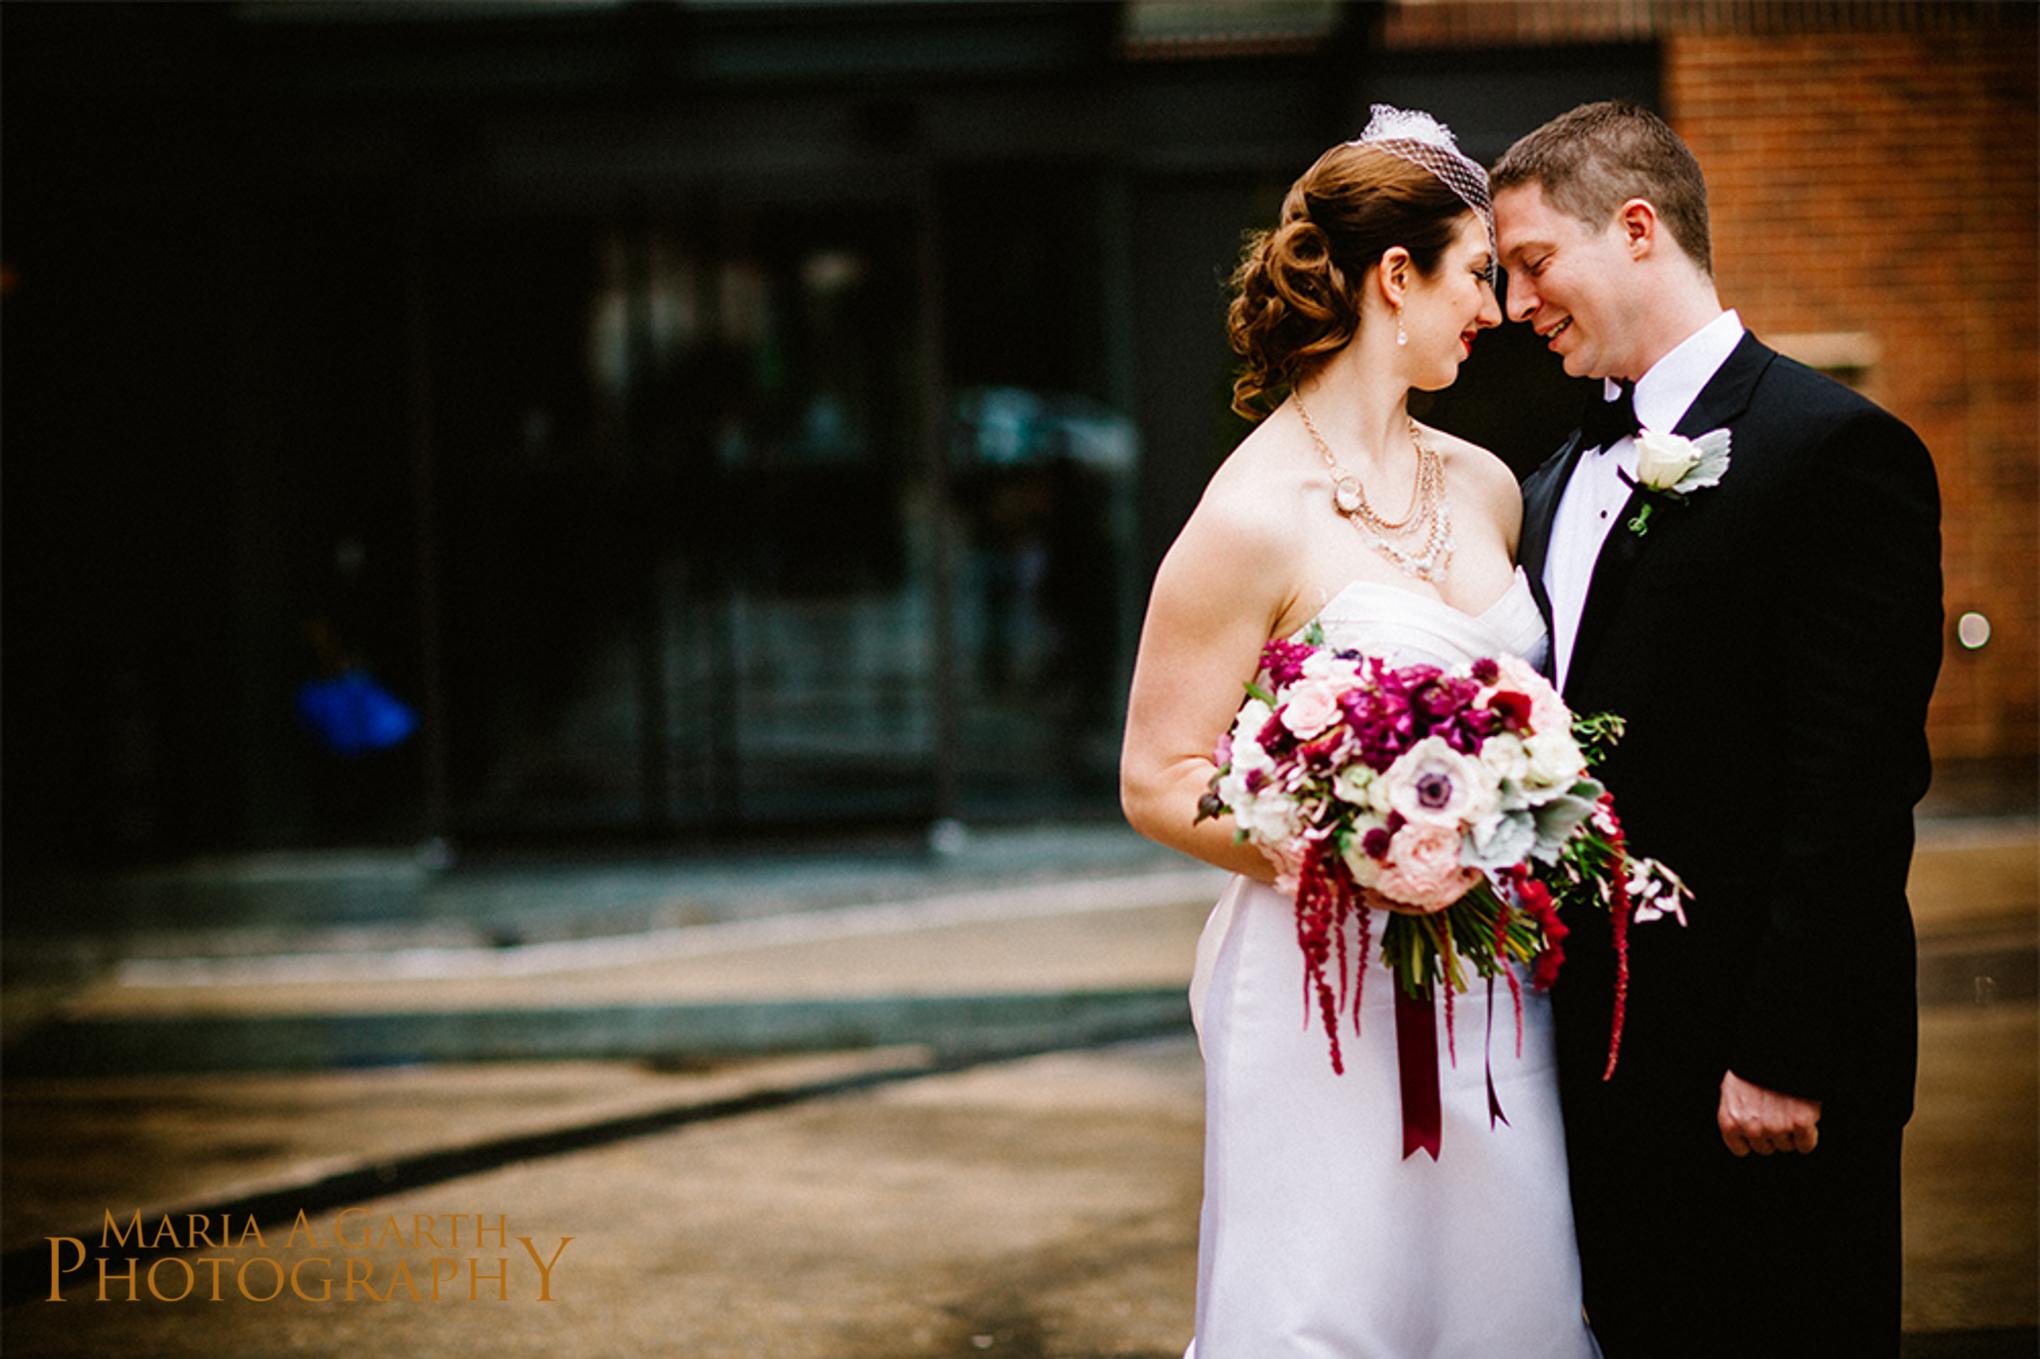 Georgetown Weddings, DC Wedding Photography, Weddings at the Ritz in DC_016.jpg